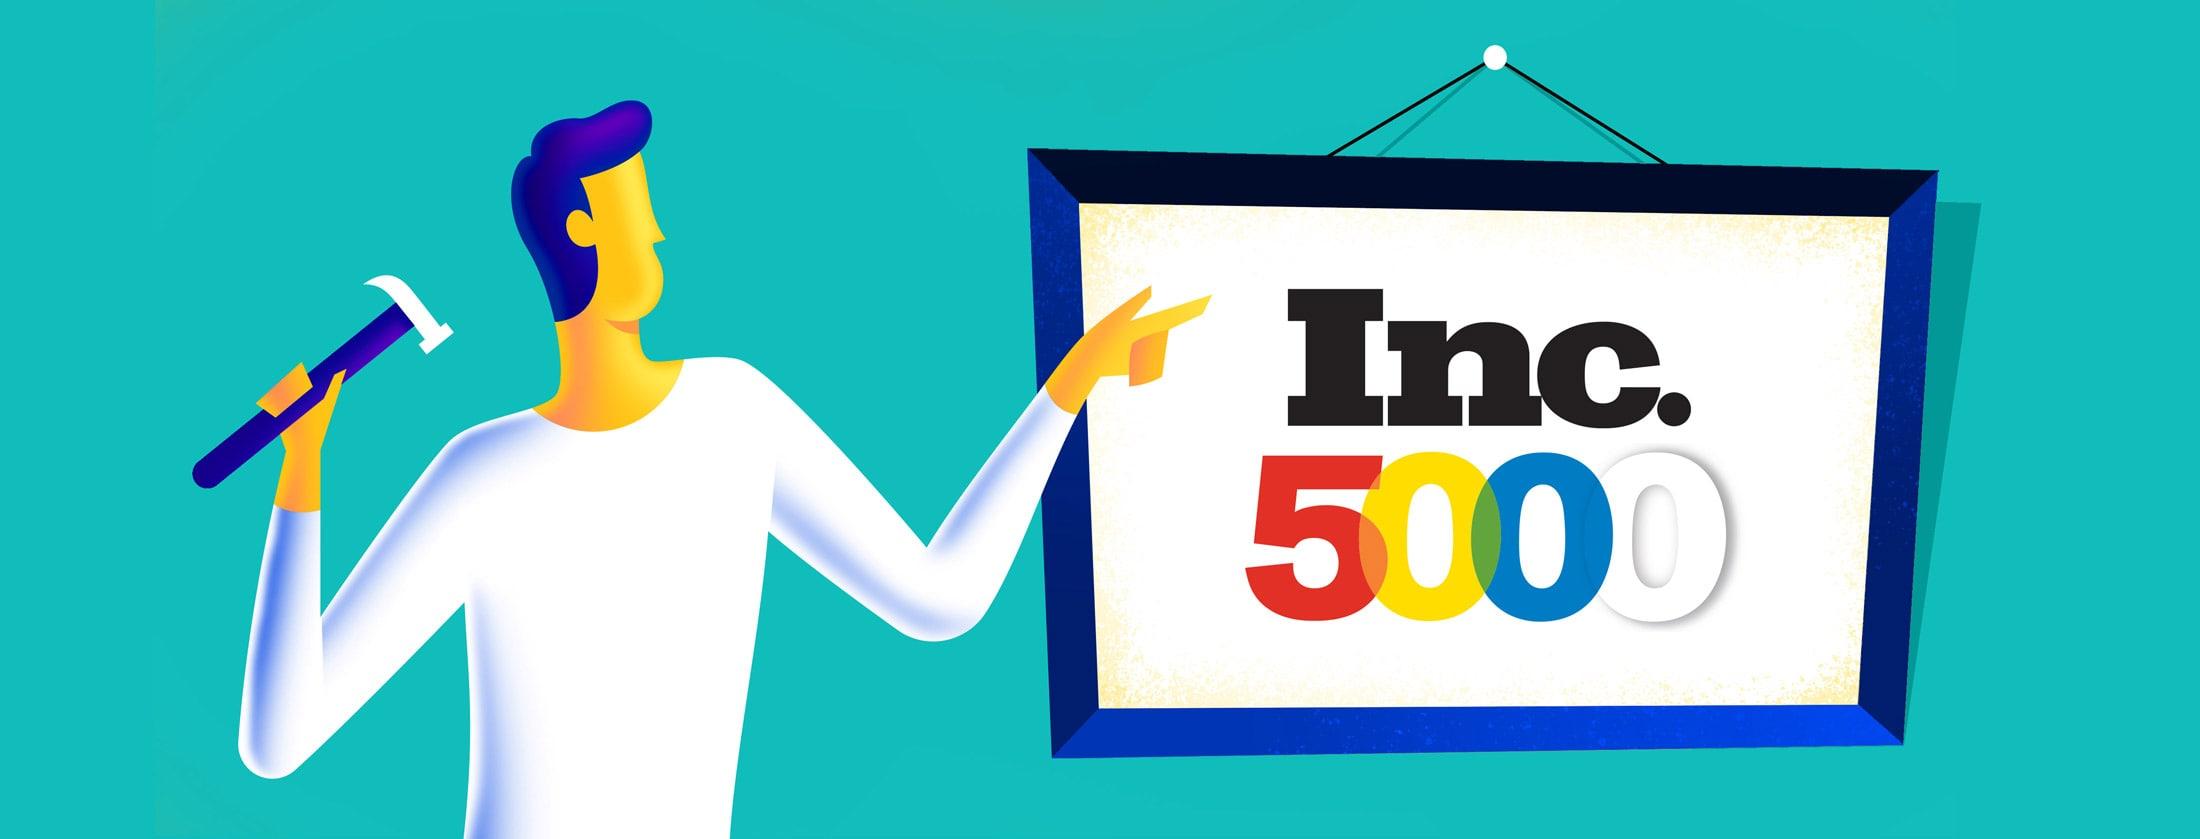 Inc. 5000 list for 2020: Health Union recognized